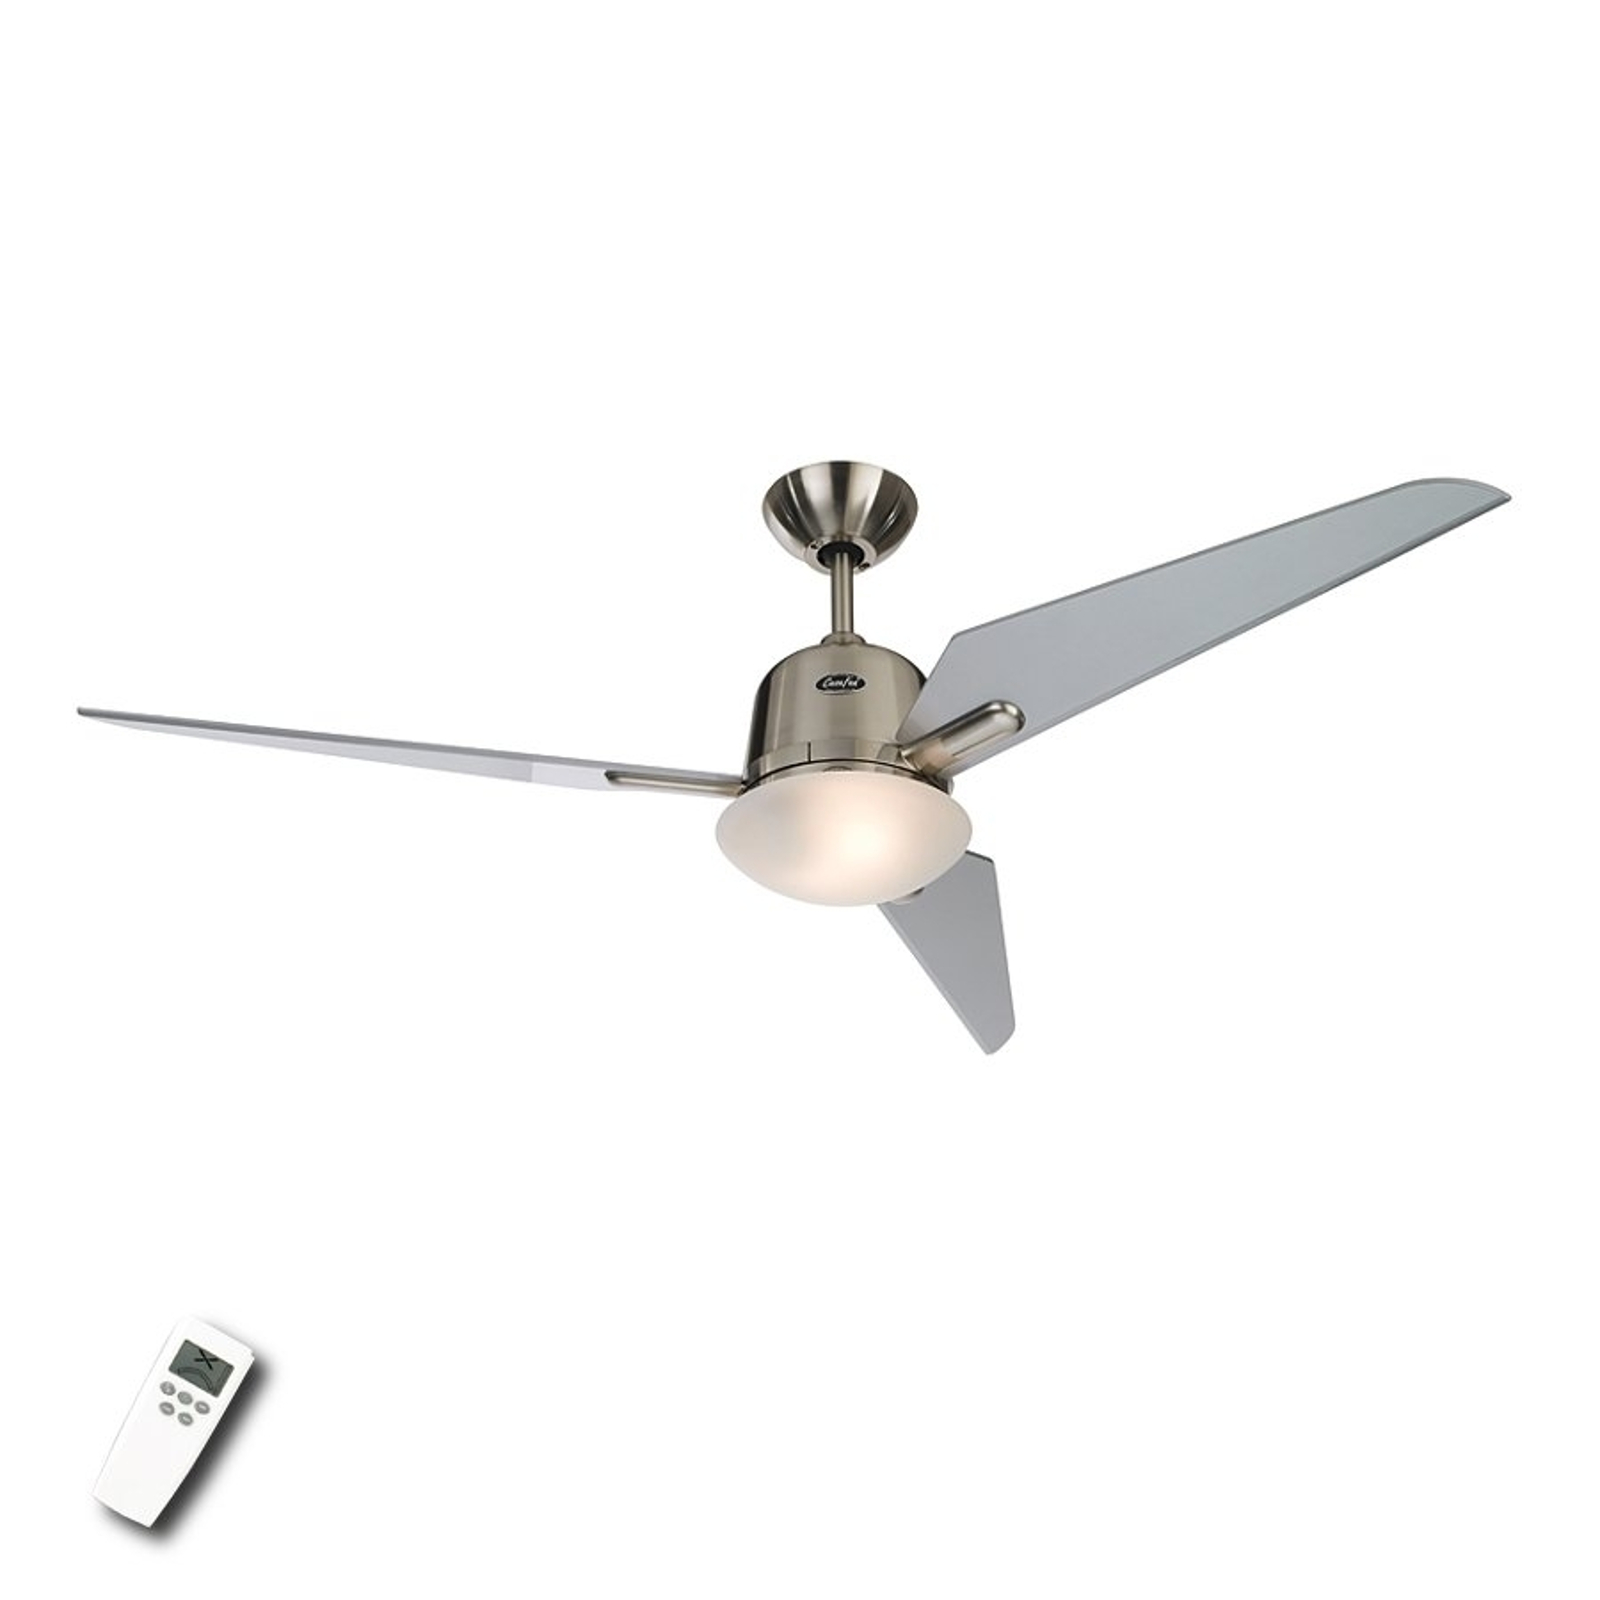 Takfläkt Eco Aviatos silver 132 cm